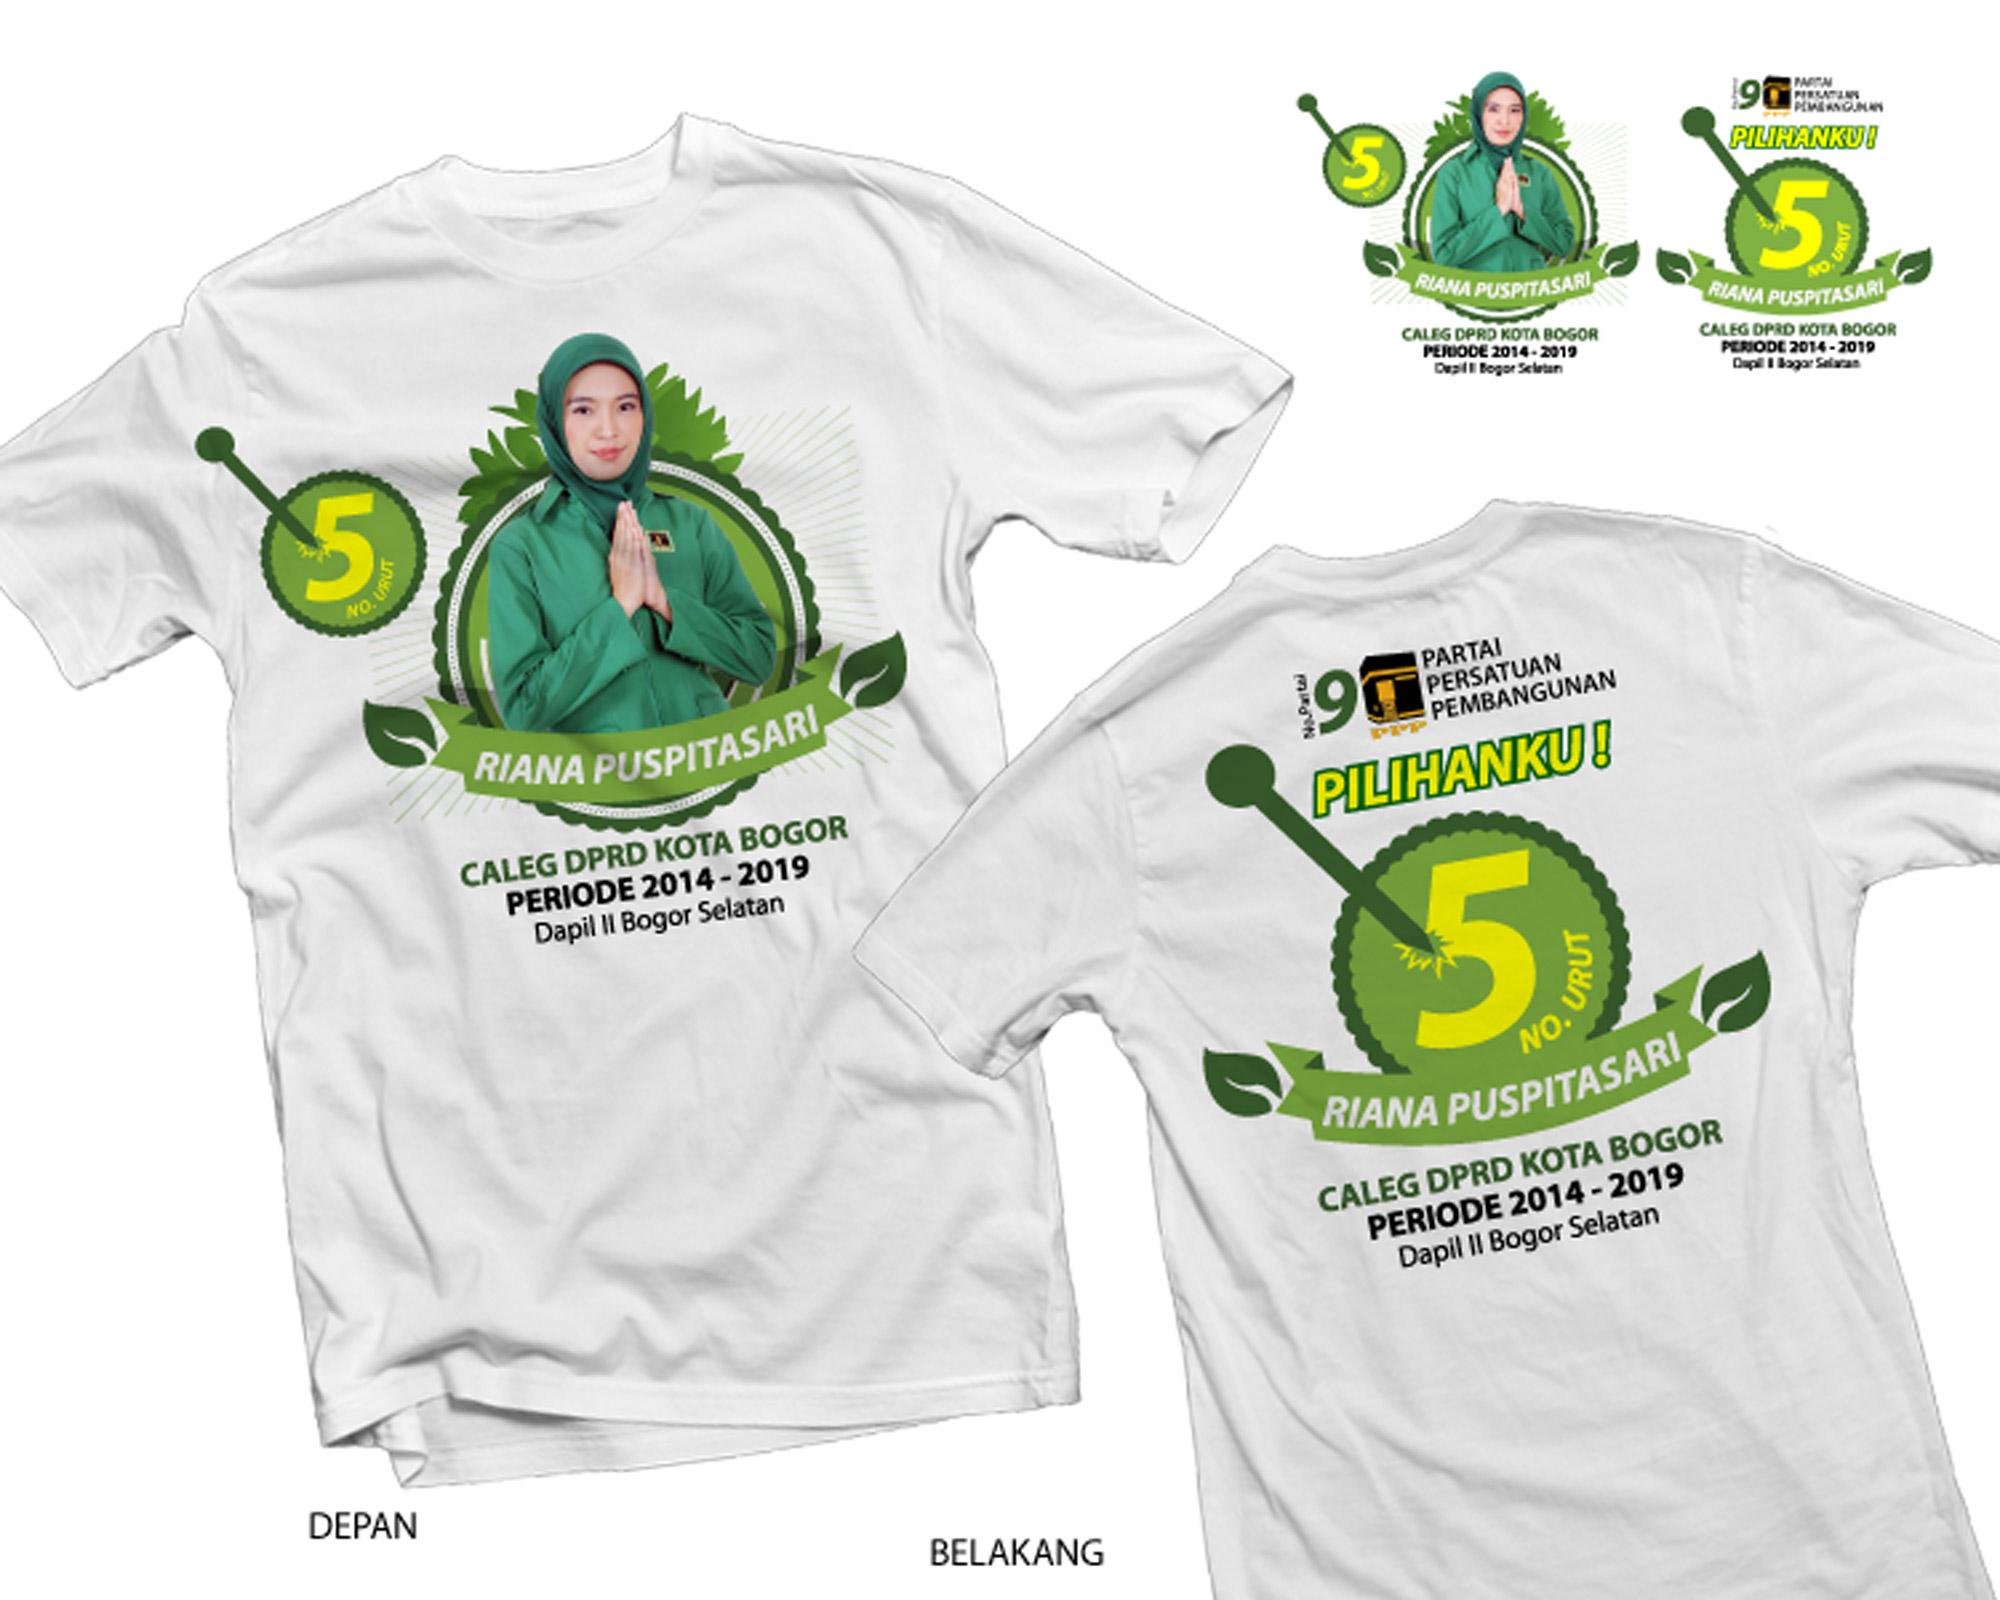 Desain t shirt unik - 24bbee4e55